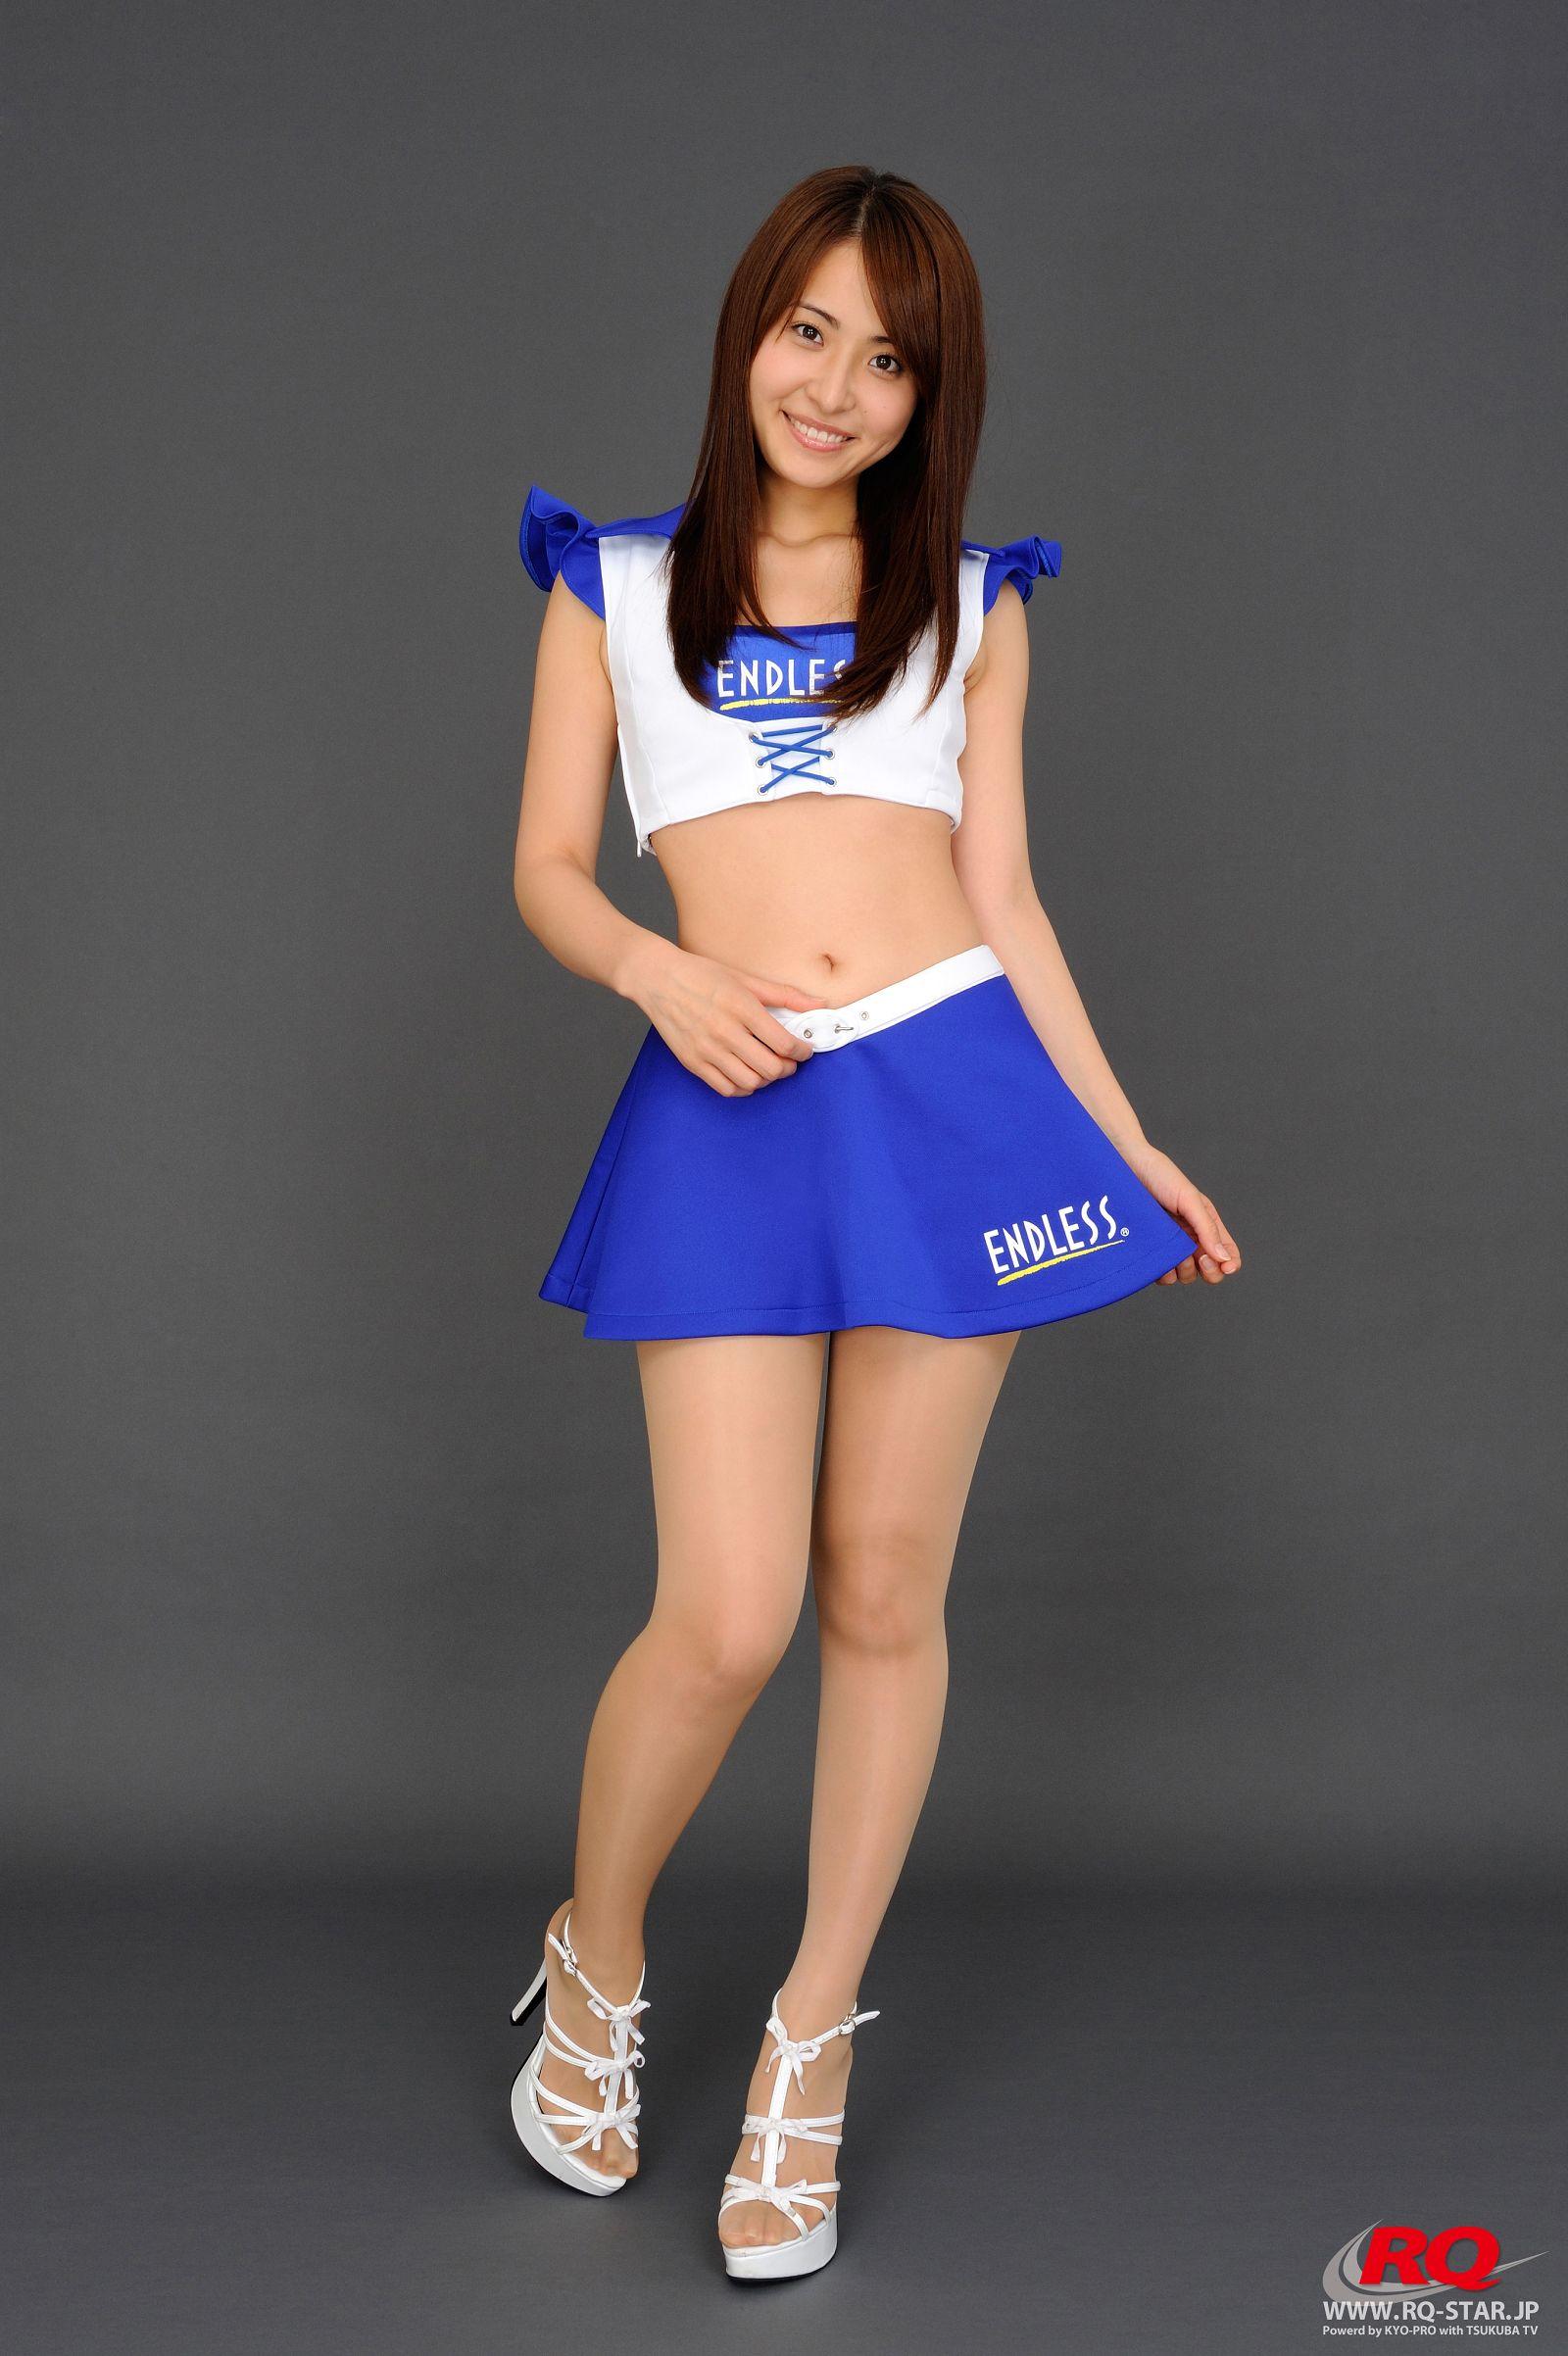 [RQ STAR美女] NO.0045 Rena Sawai 澤井玲菜 Race Queen 2008 Endless[127P] RQ STAR 第1张